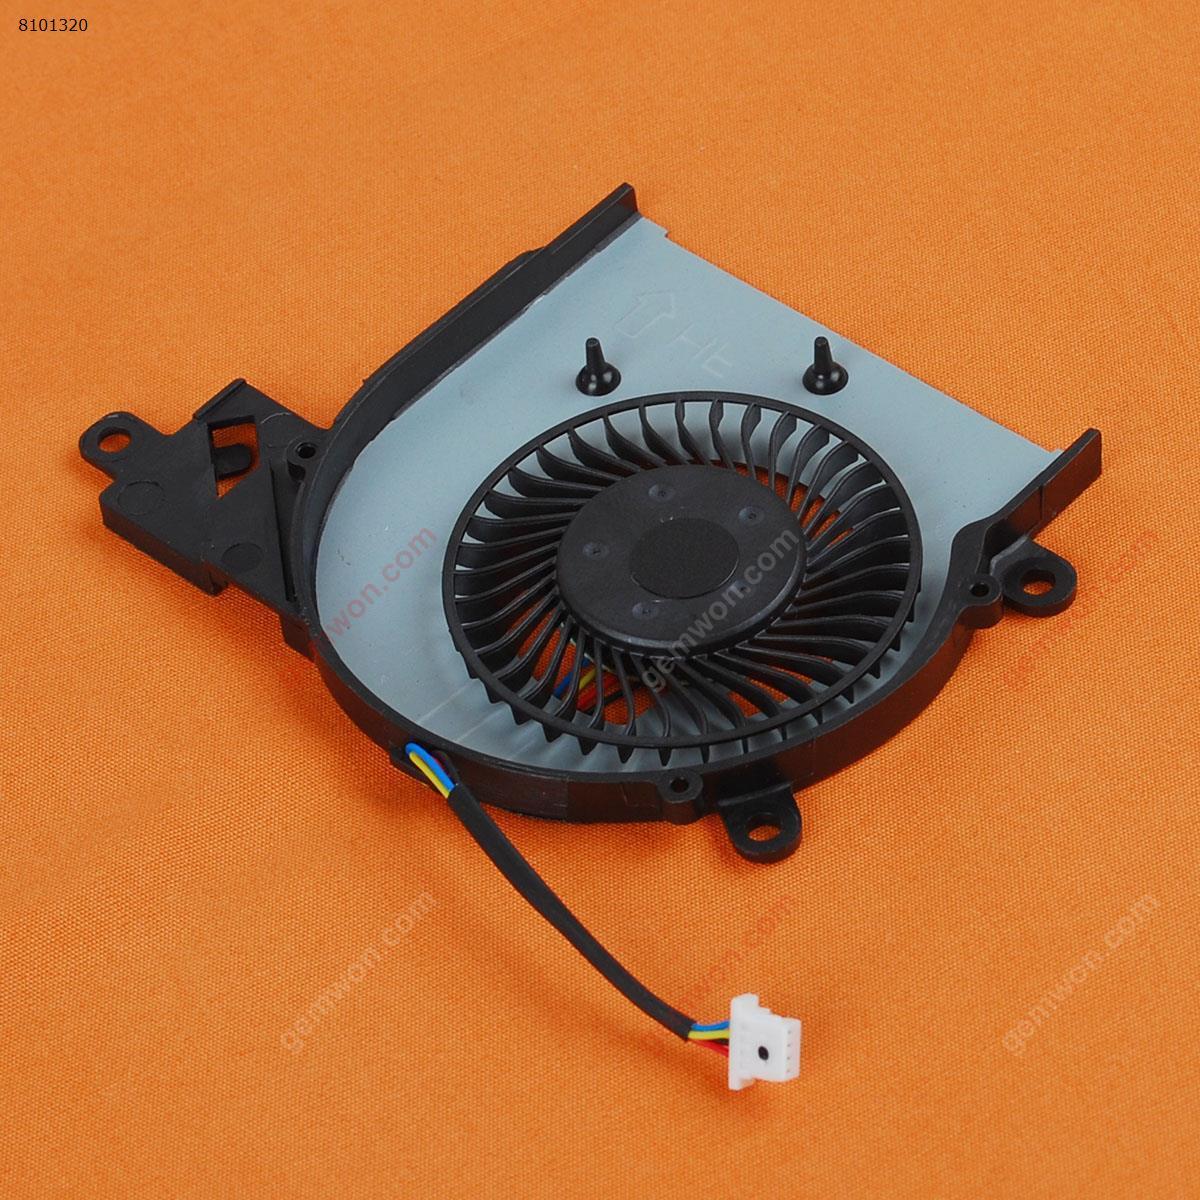 HP Pavlion X360 13-S020NR(Original) Laptop Fan DFS400705PU0T    023.1003B.0001